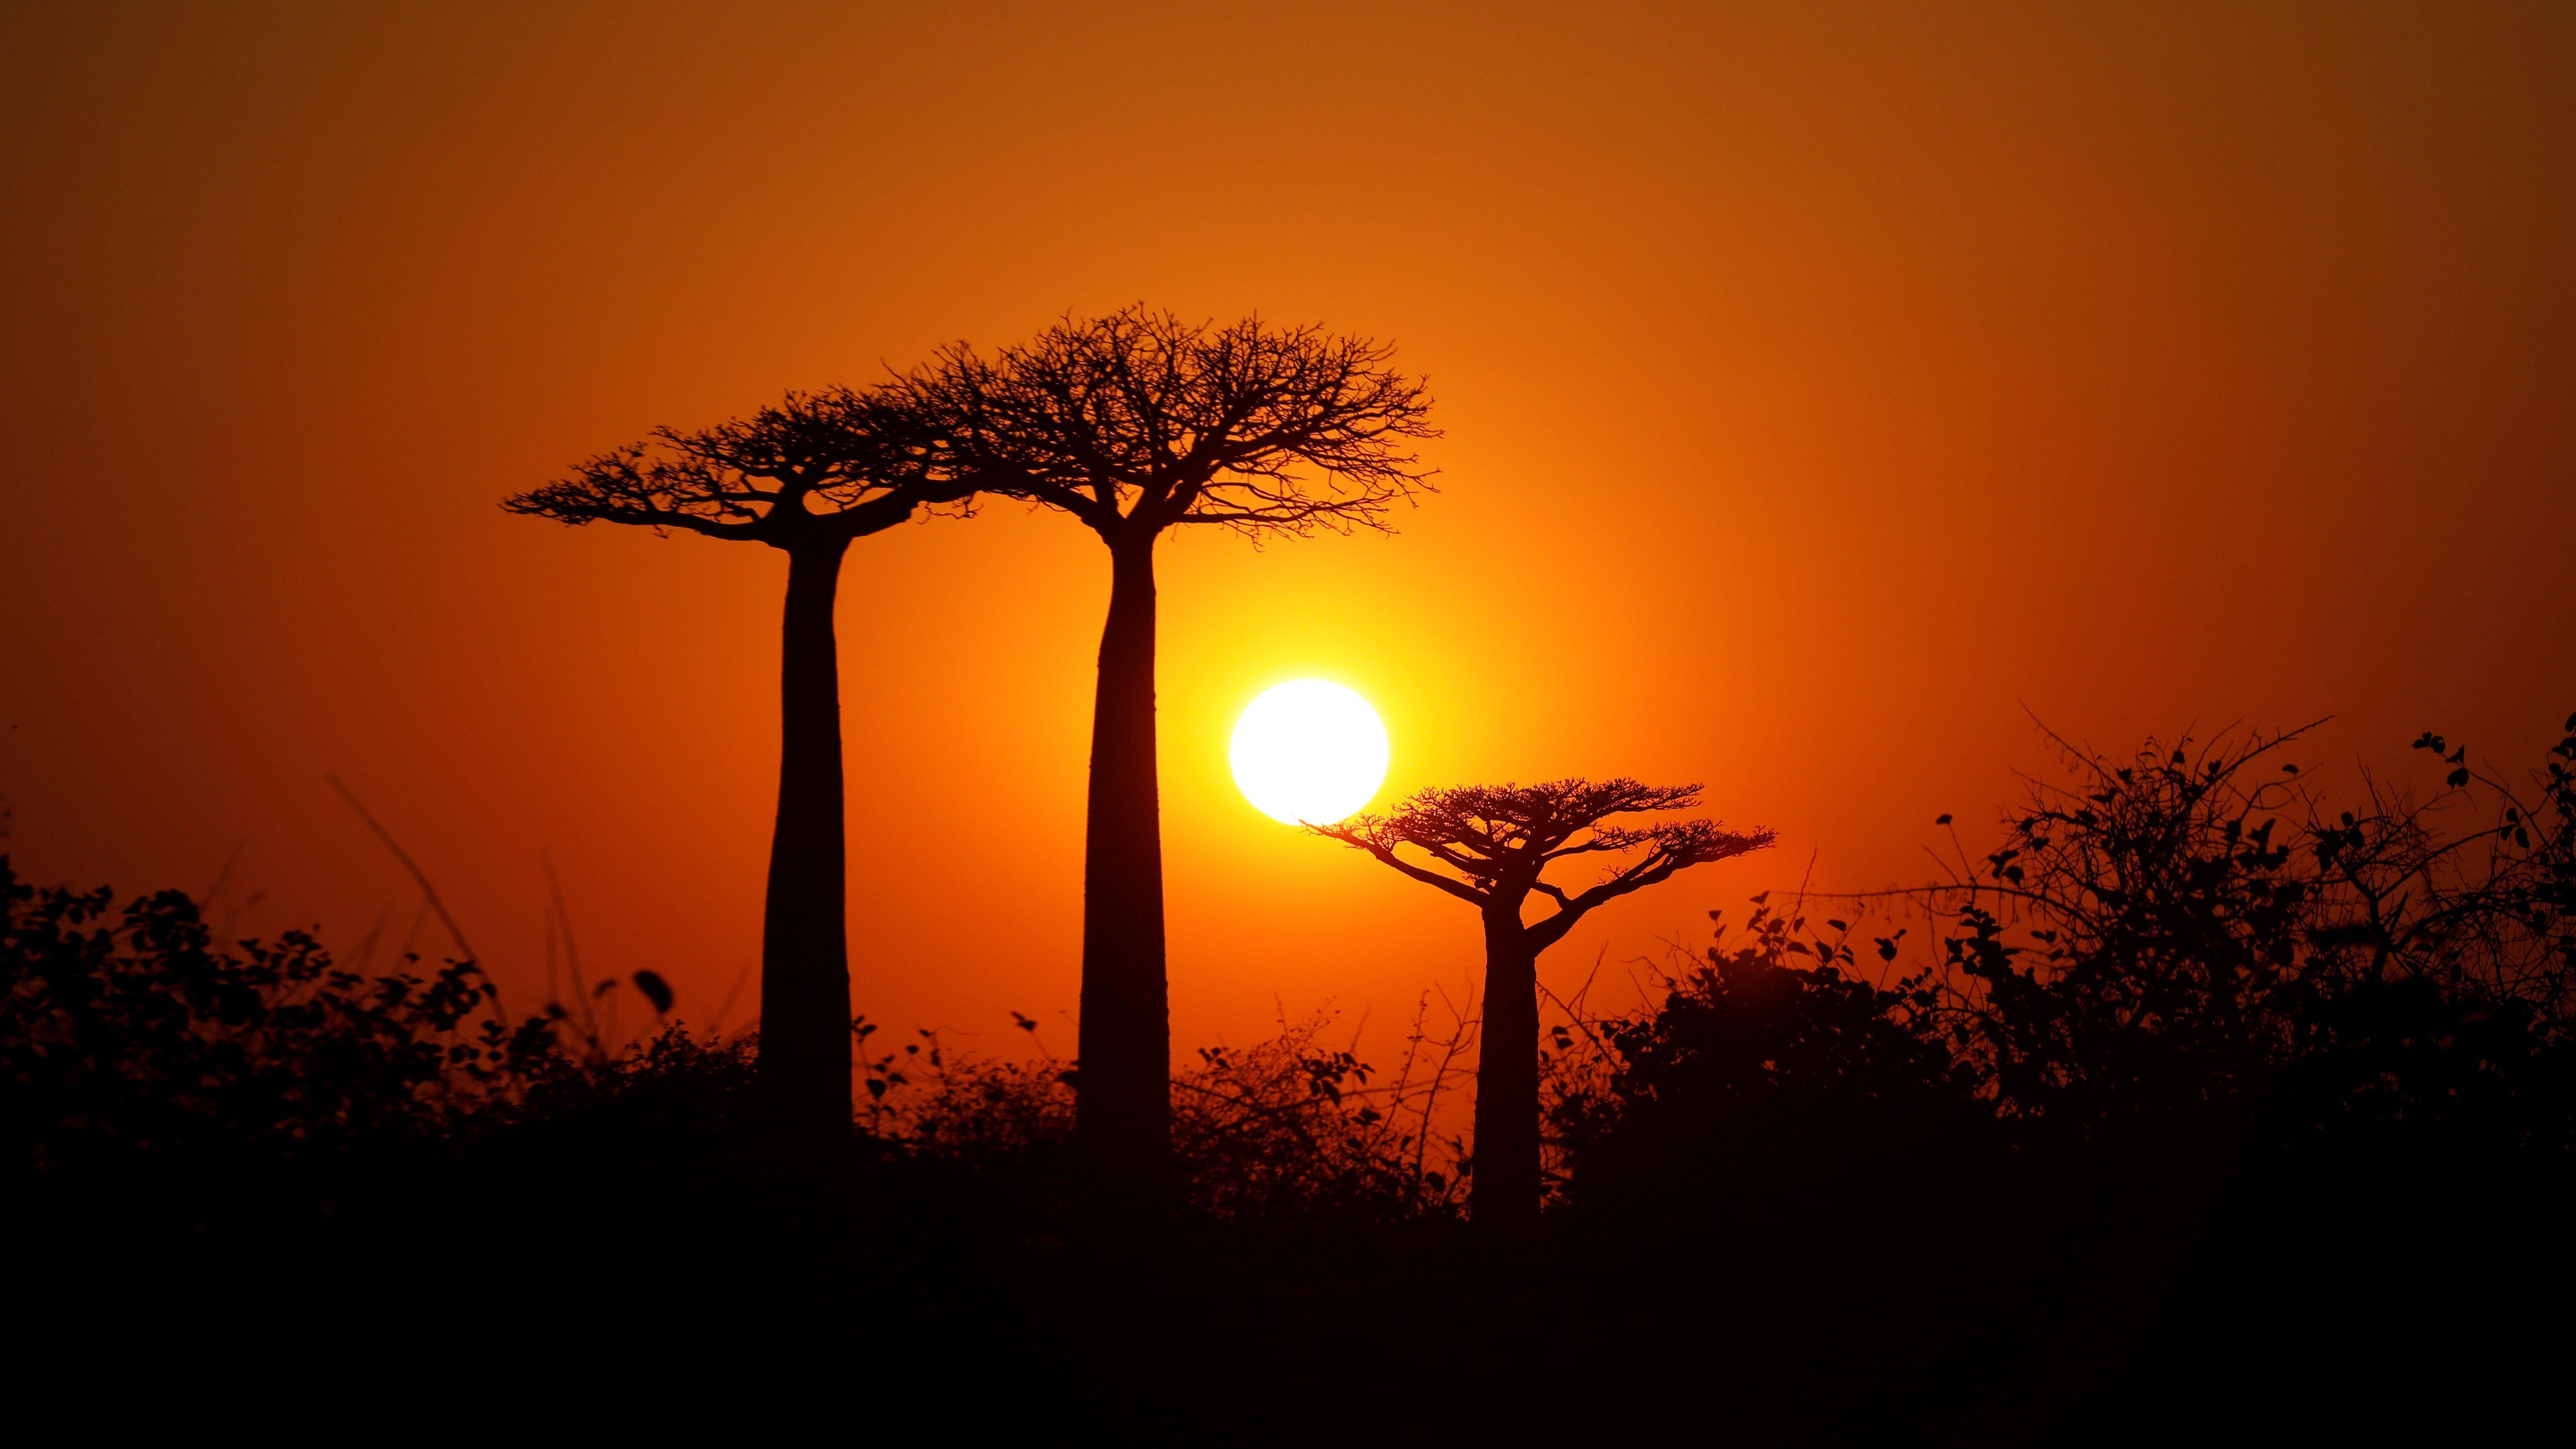 The sun rises behind Baobab trees at Baobab alley near the city of Morondava